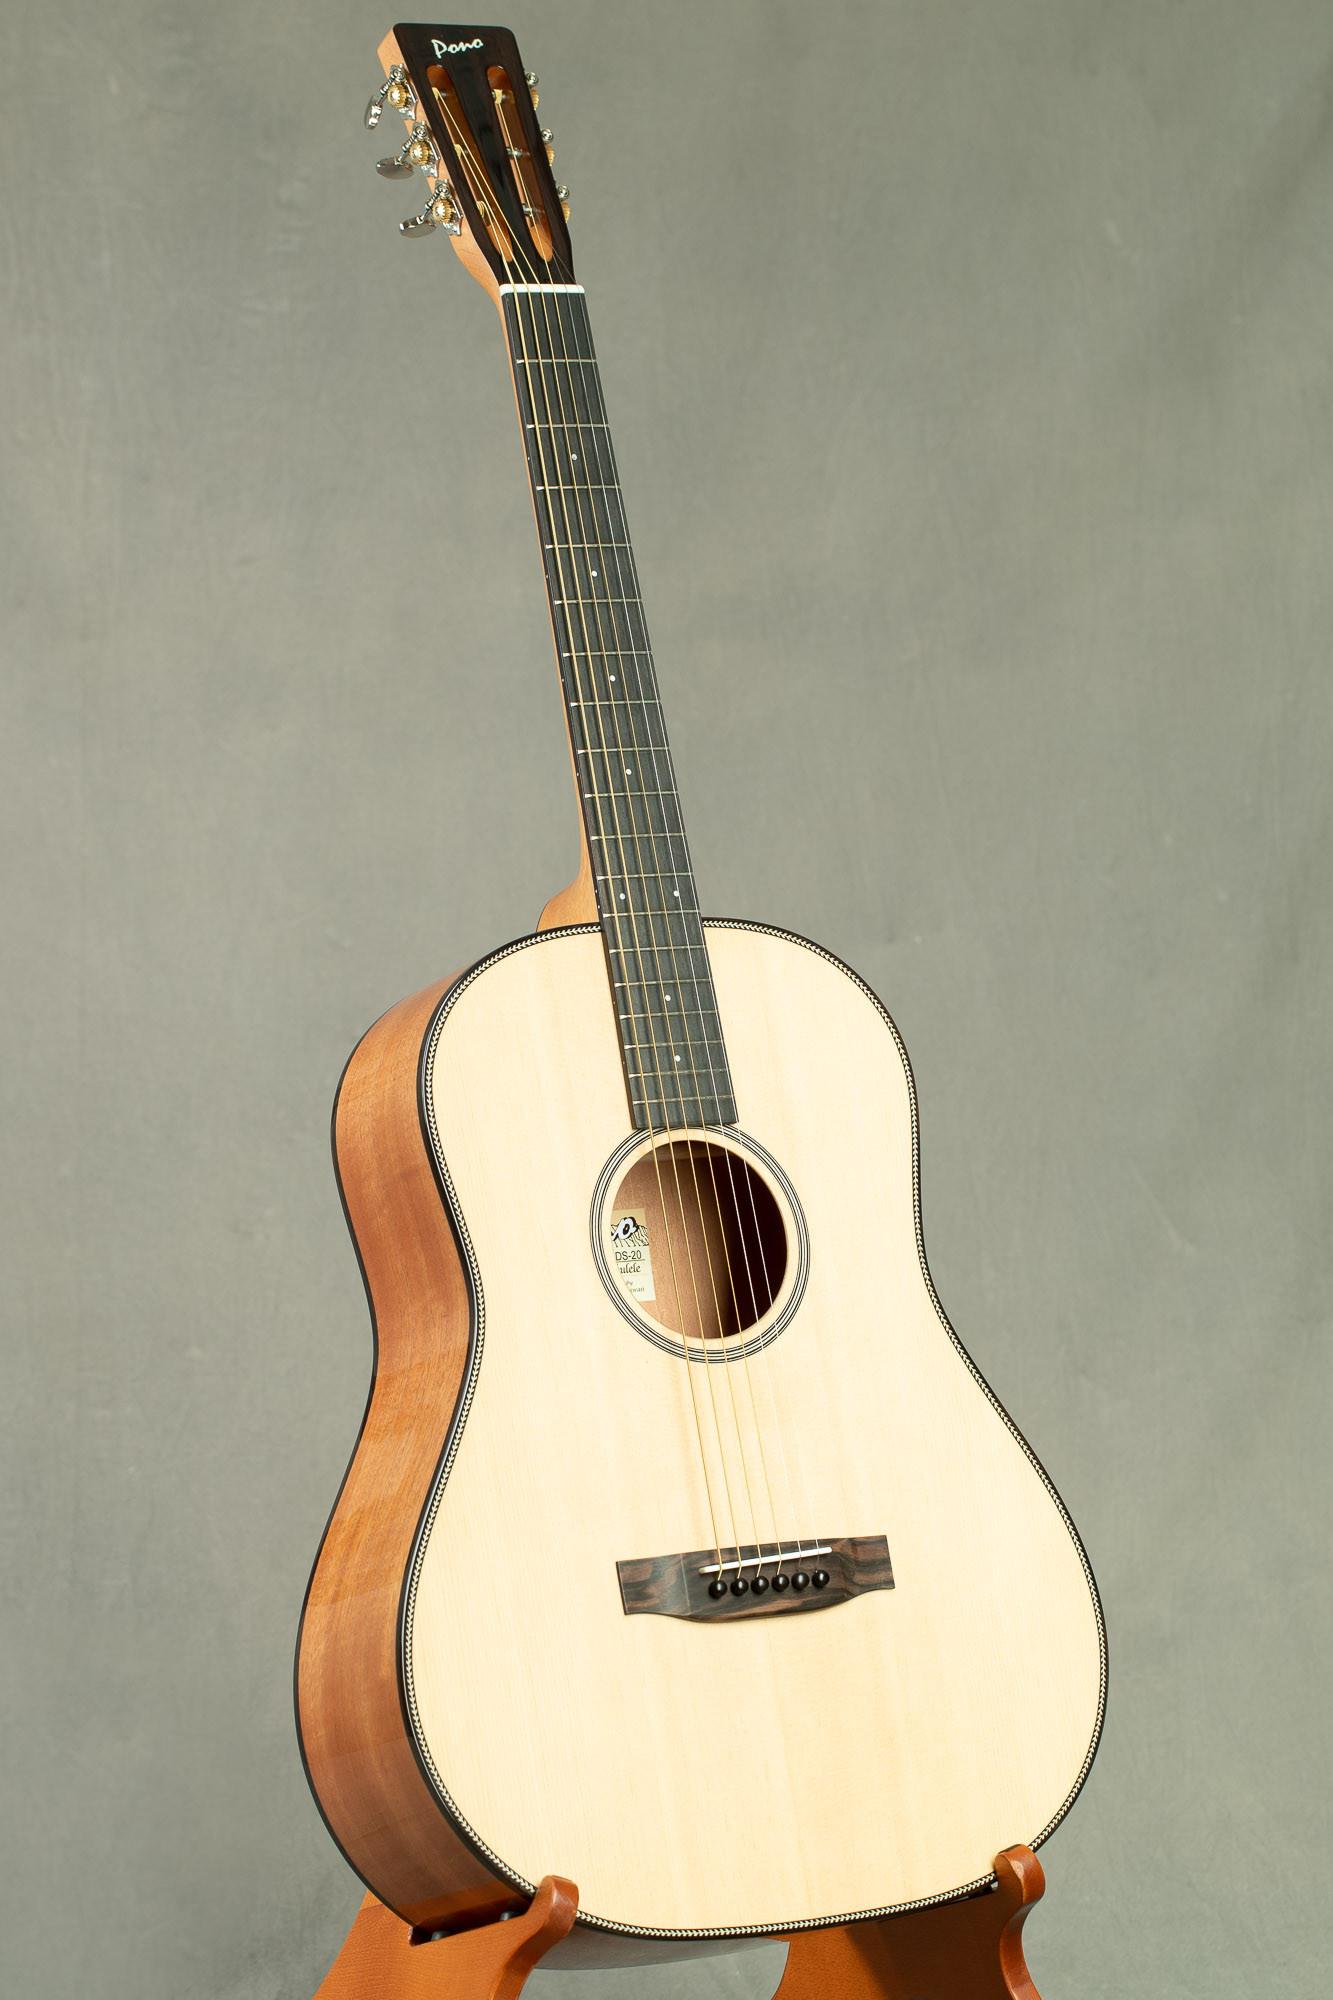 Pono Spruce Top Mahogany Sloped Shoulder Dreadnaught Guitar (DS-20 3440)